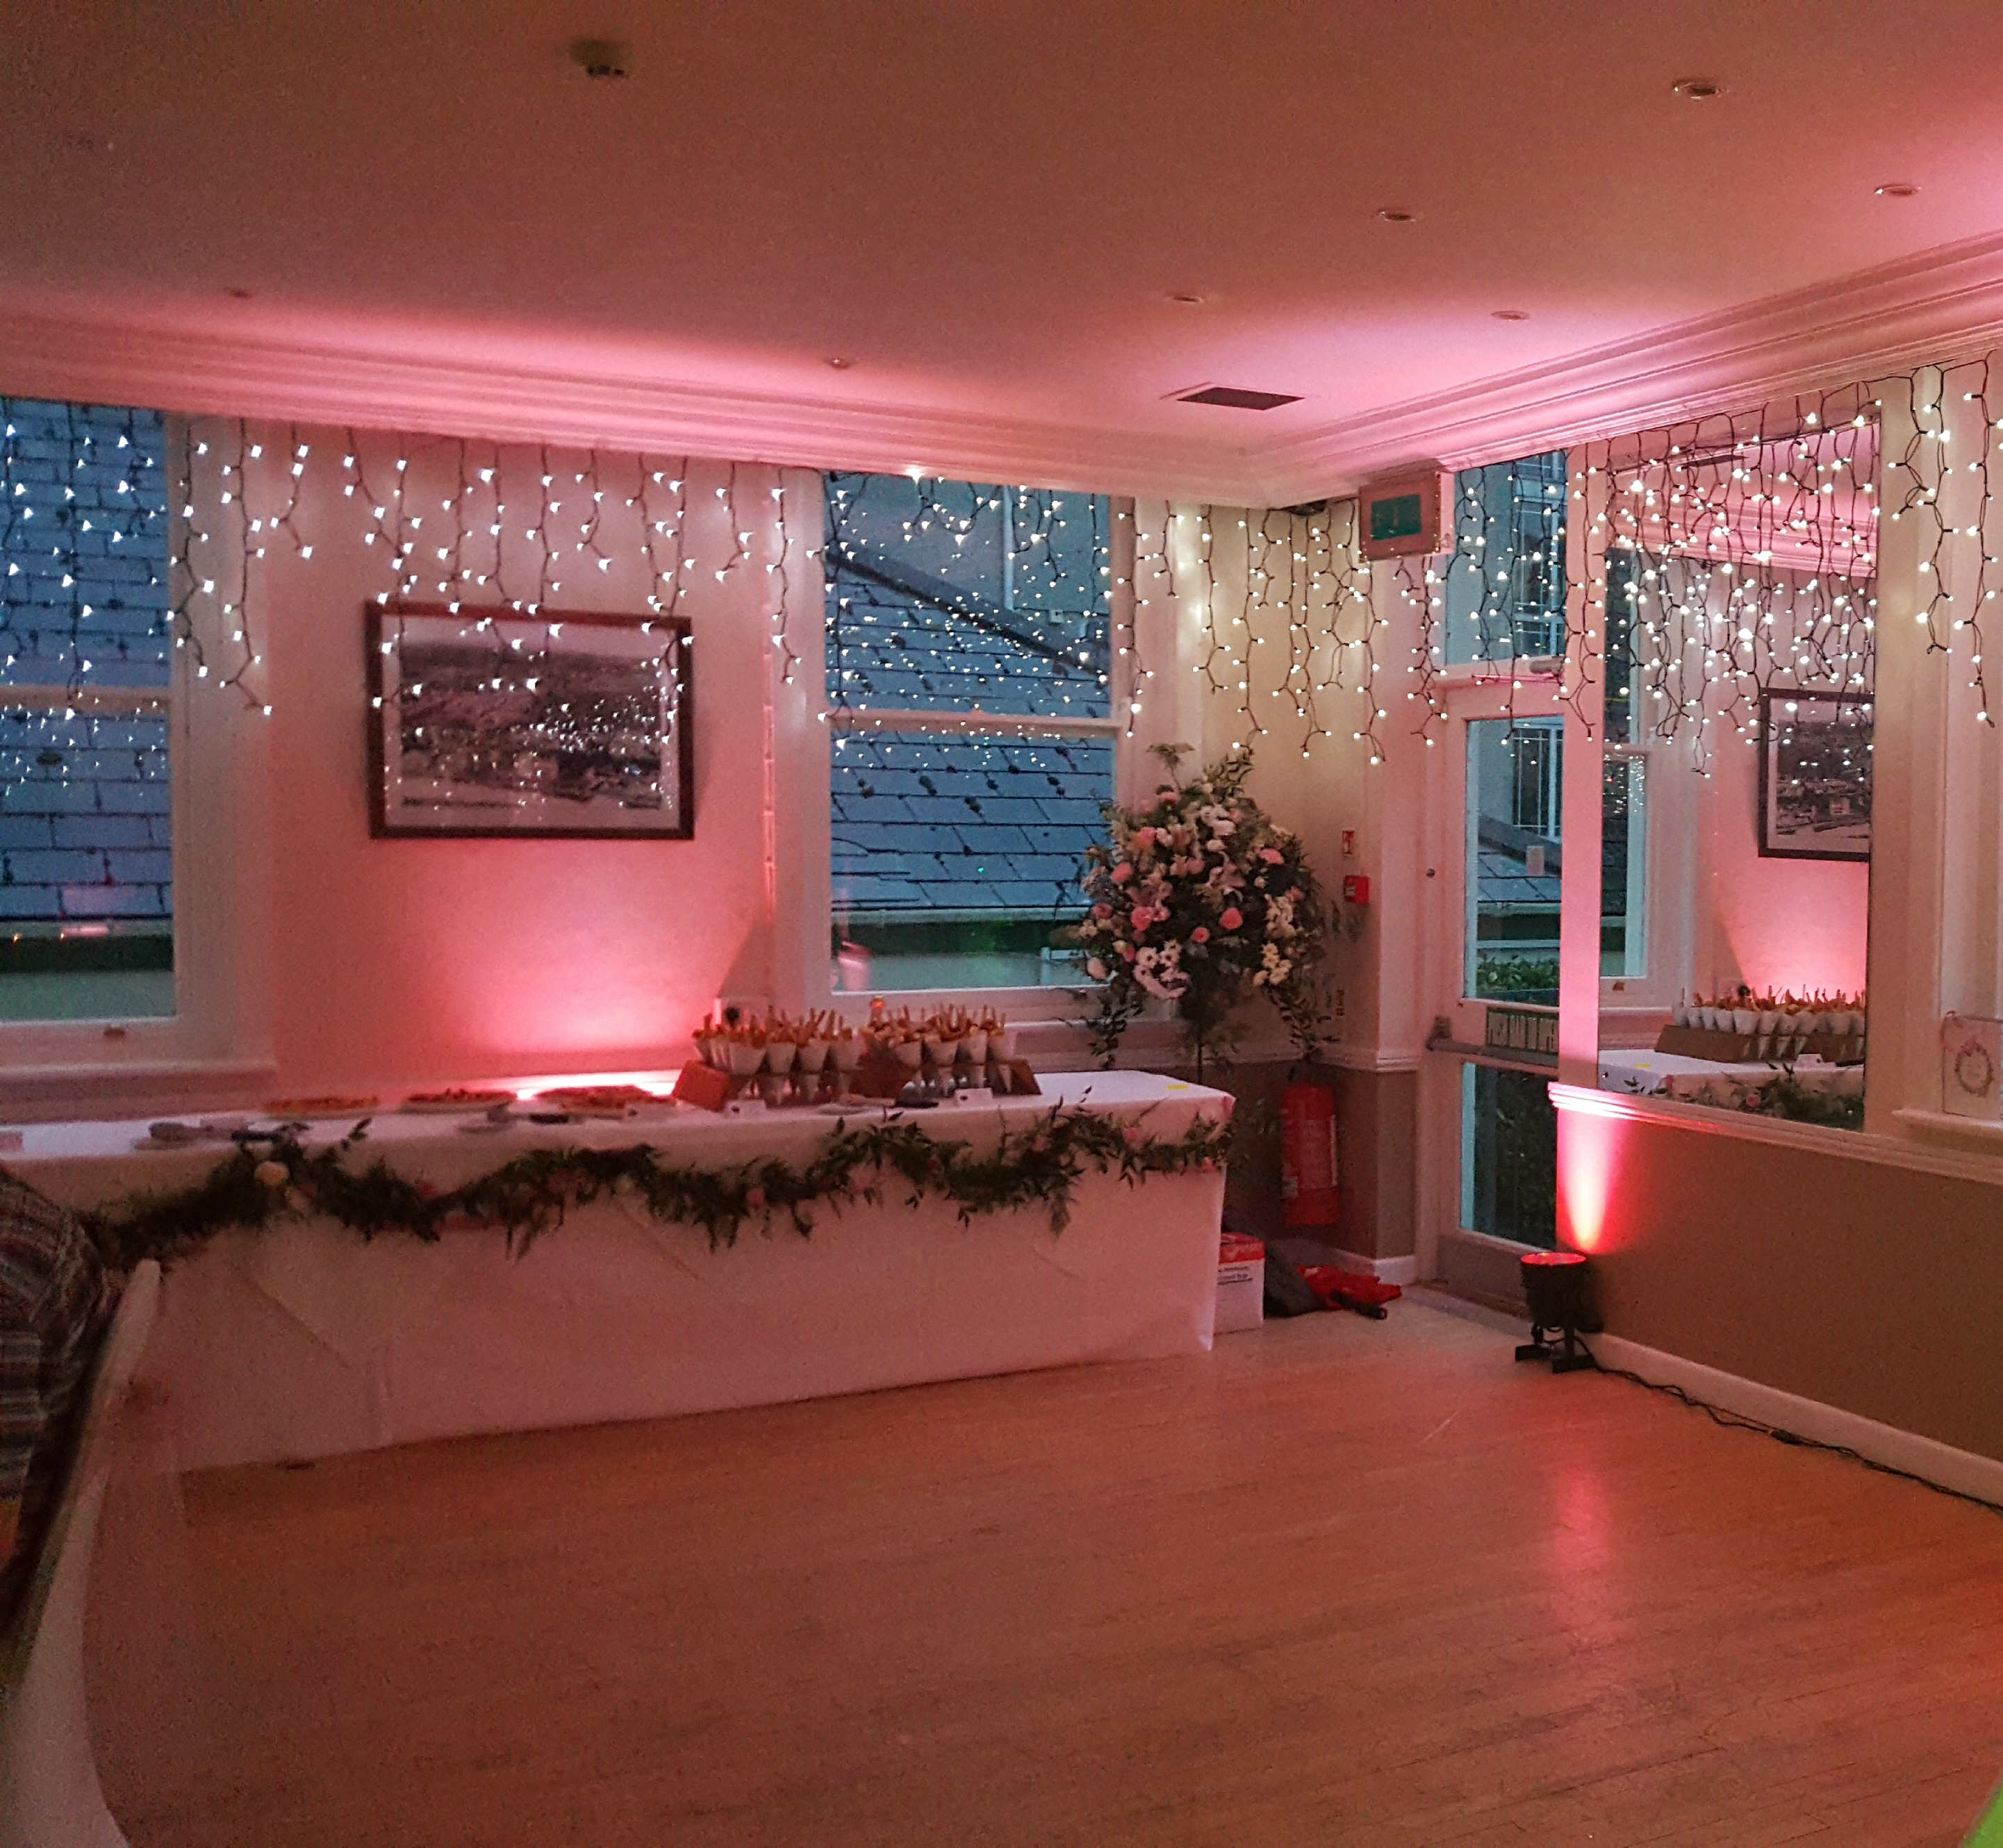 ASY Cornwall Wedding Uplighting 2